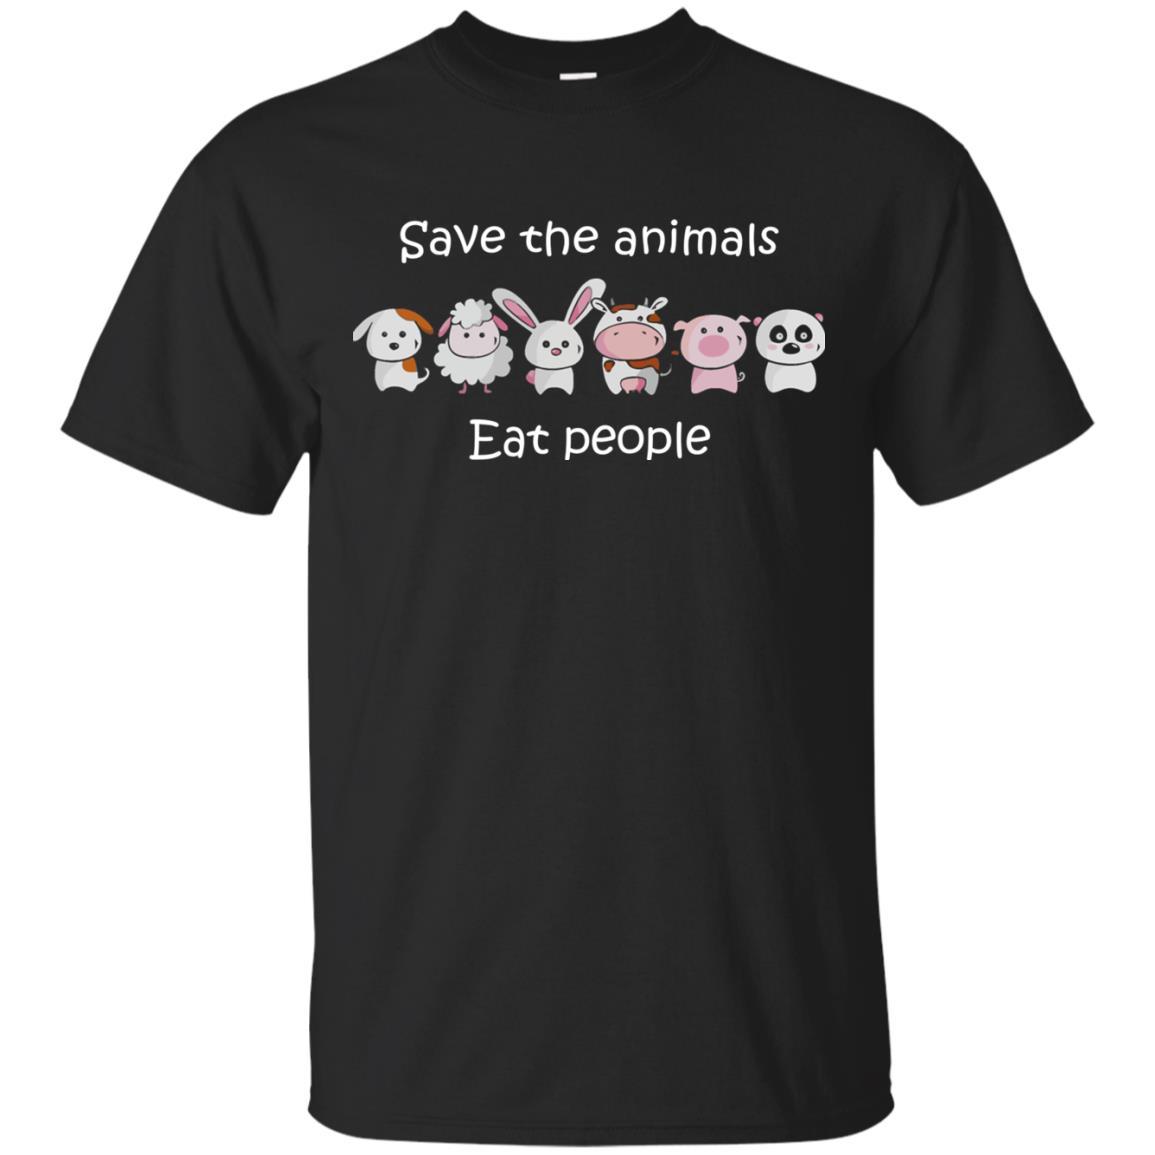 image 1509px Funny vegan shirt: save the animals eat people t shirt, hoodies, tank top